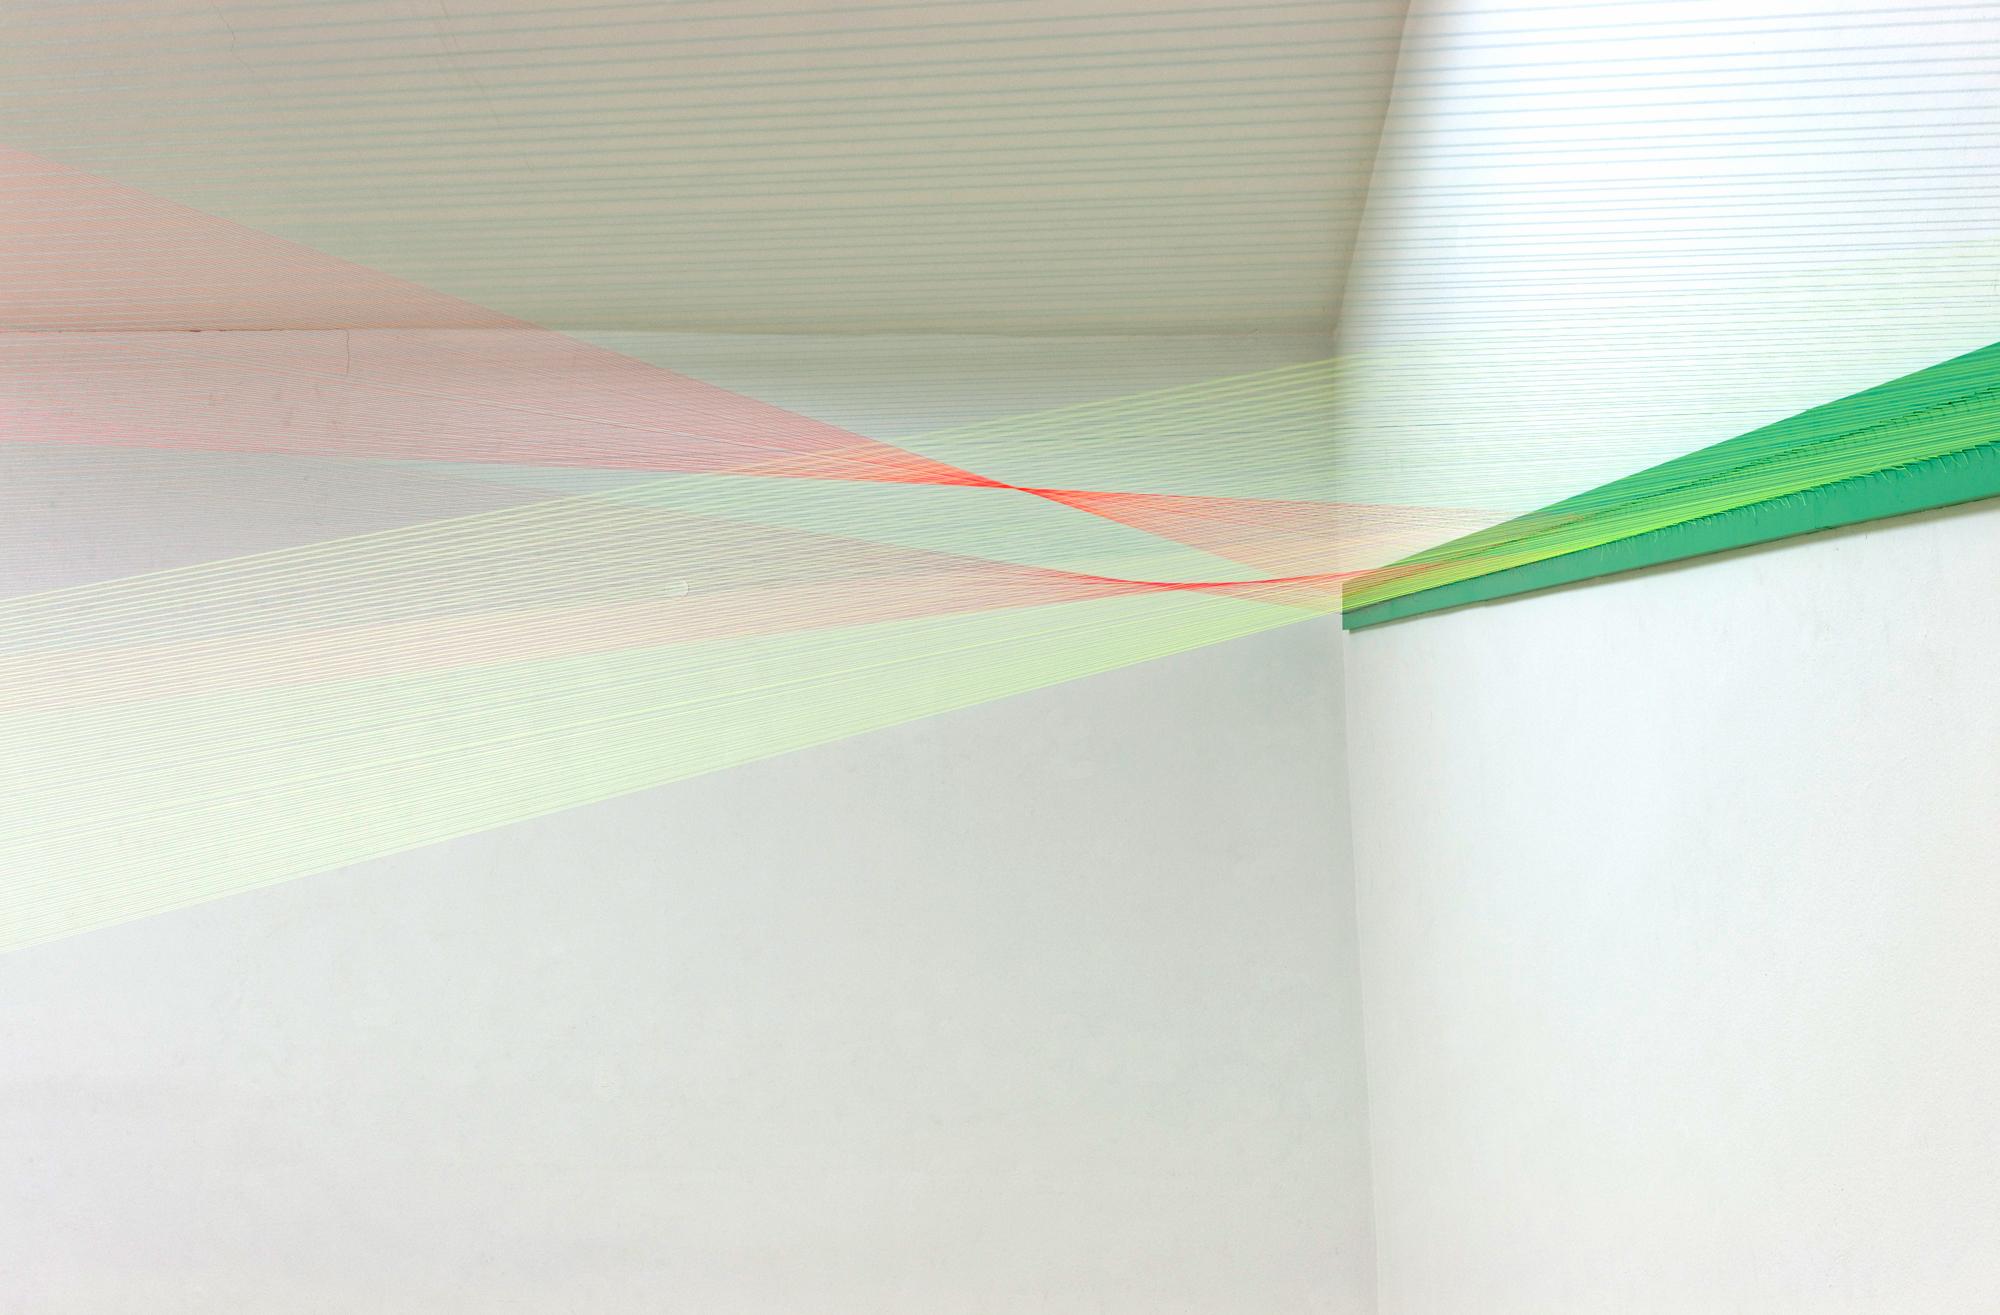 Kate-Terry-Thread-Installation-42_e.jpg